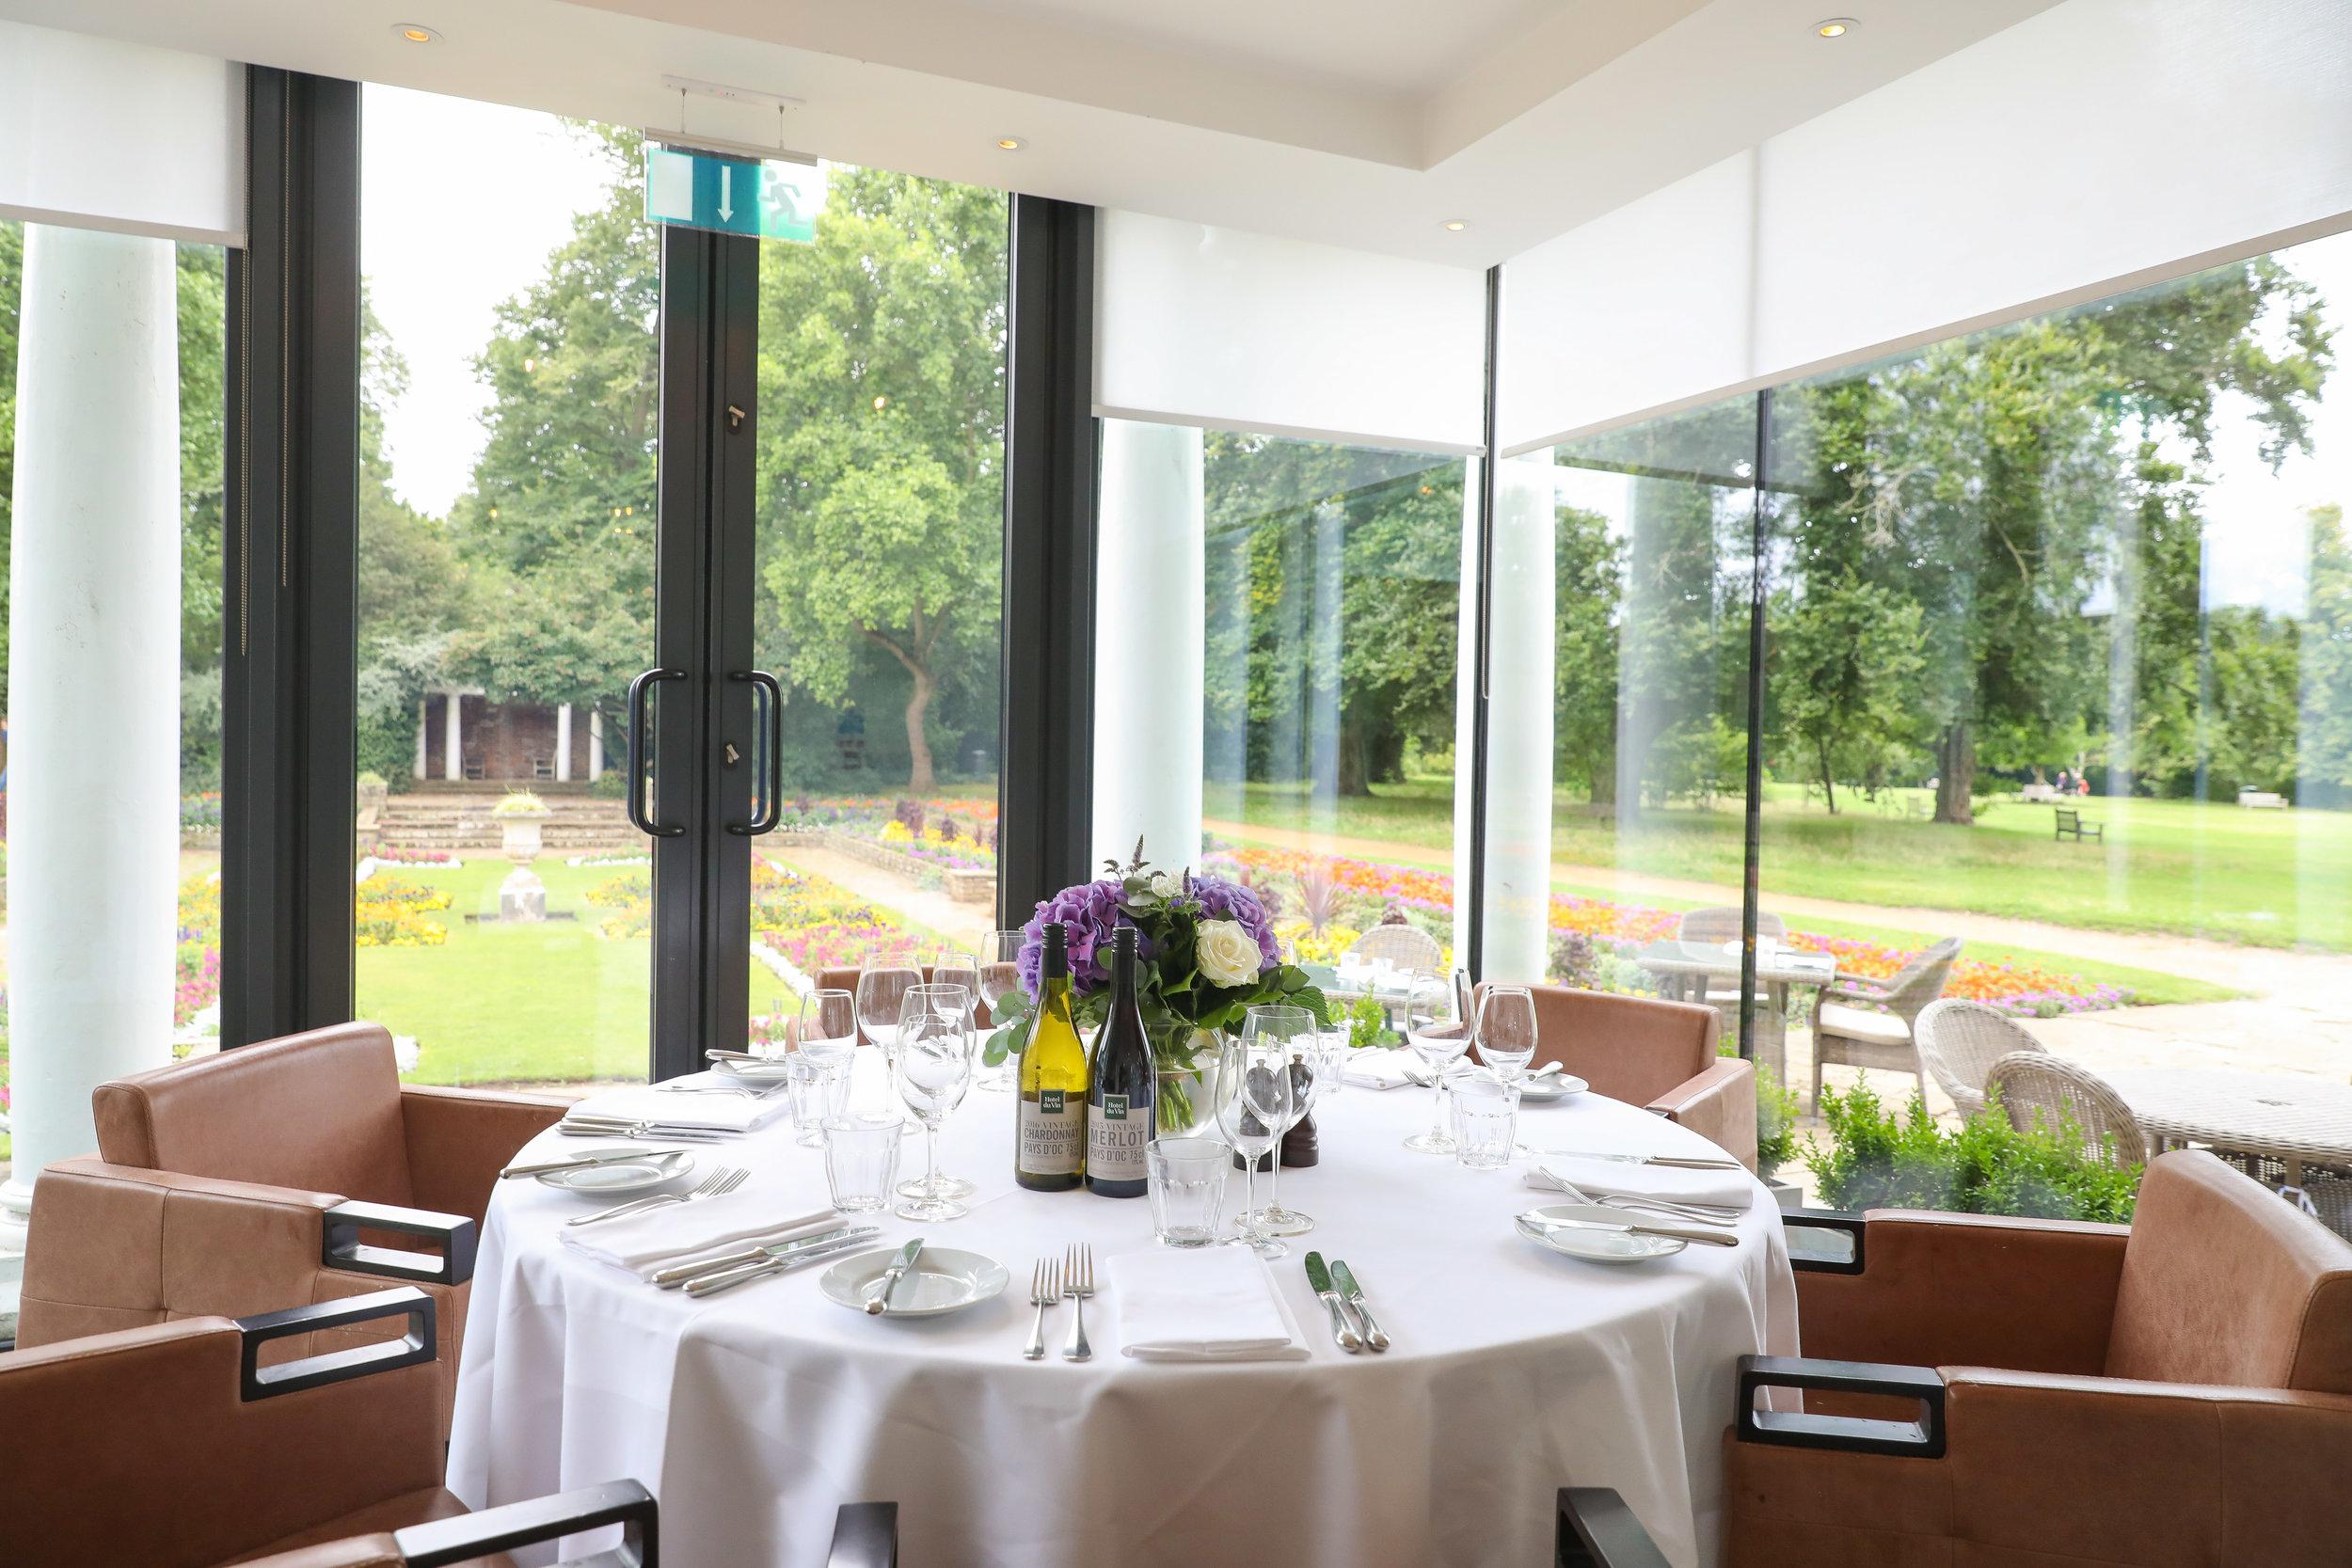 Opus one room cannizaro house wimbledon tennis vip lunch hospitality